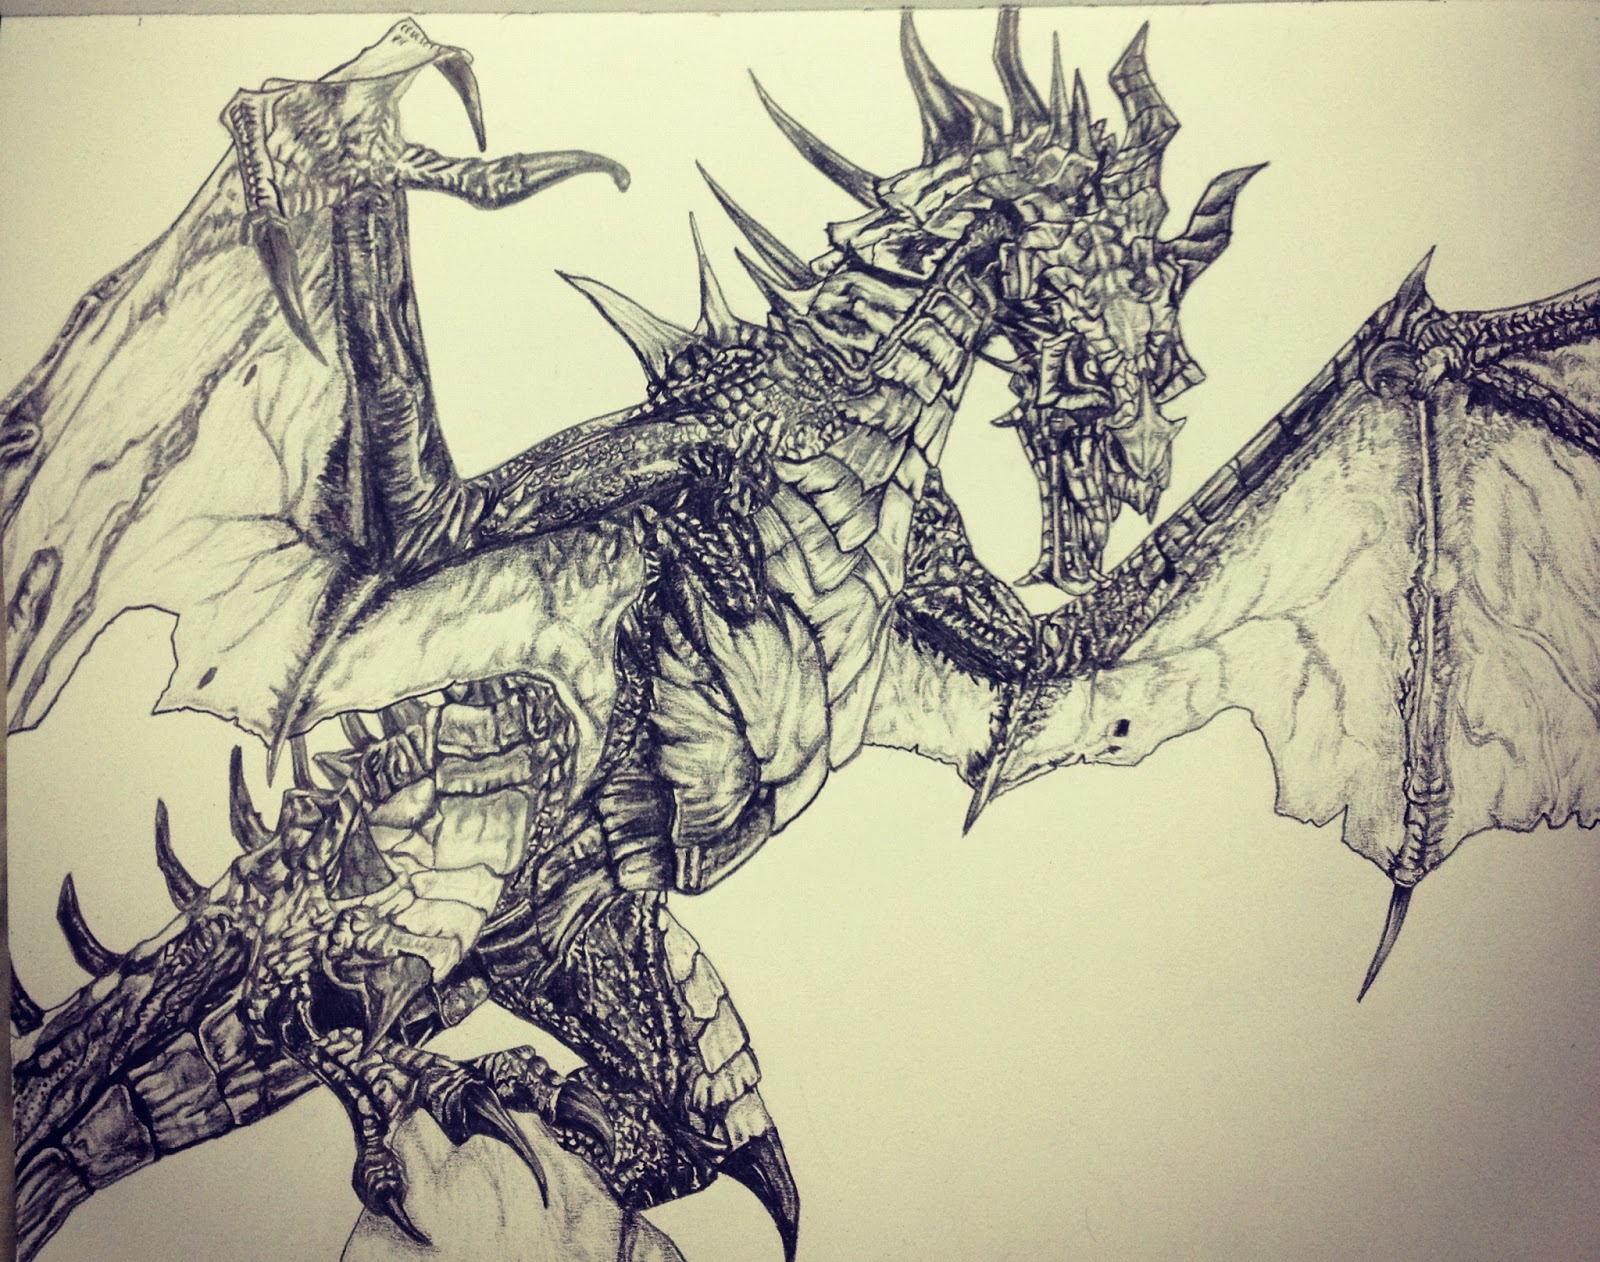 1600x1262 Pencil Dragon Drawings Skyrim Dragon Drawings In Pencil Dragon